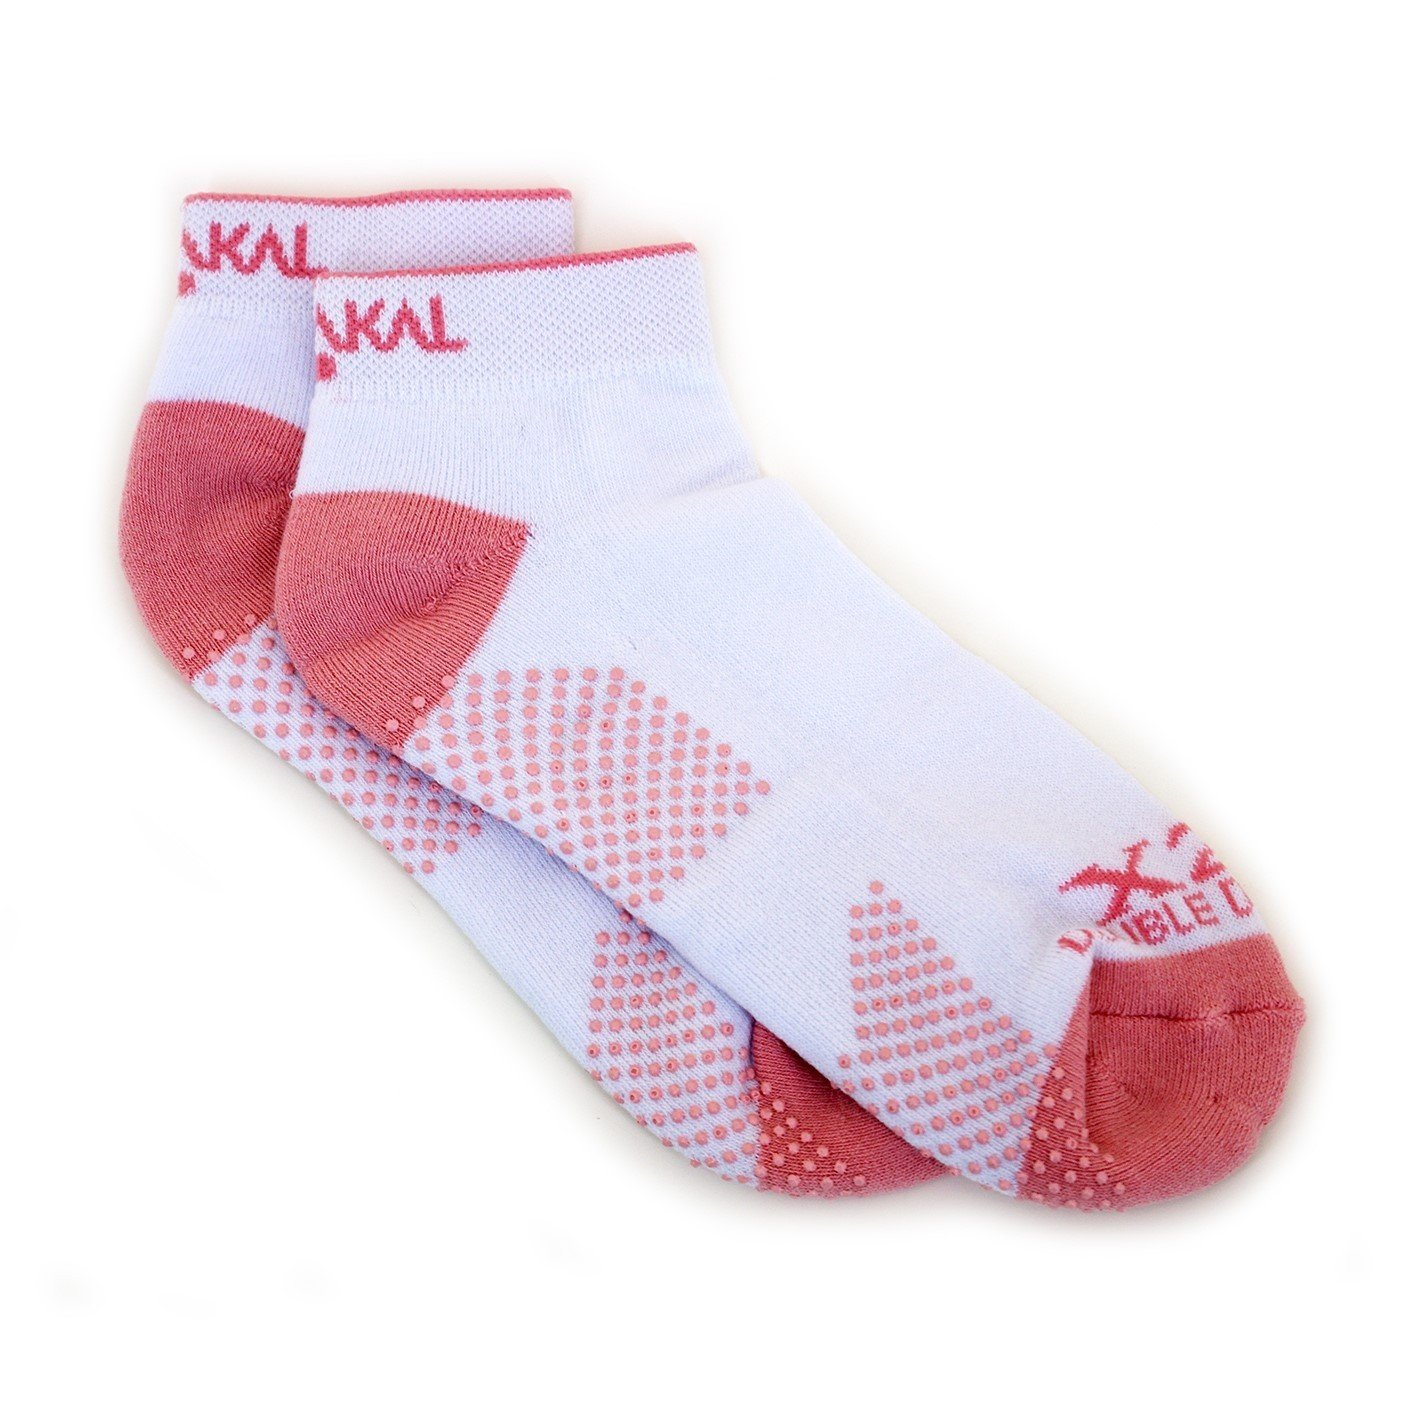 Karakal X2+ Ladies Trainer Socks - White and Pink